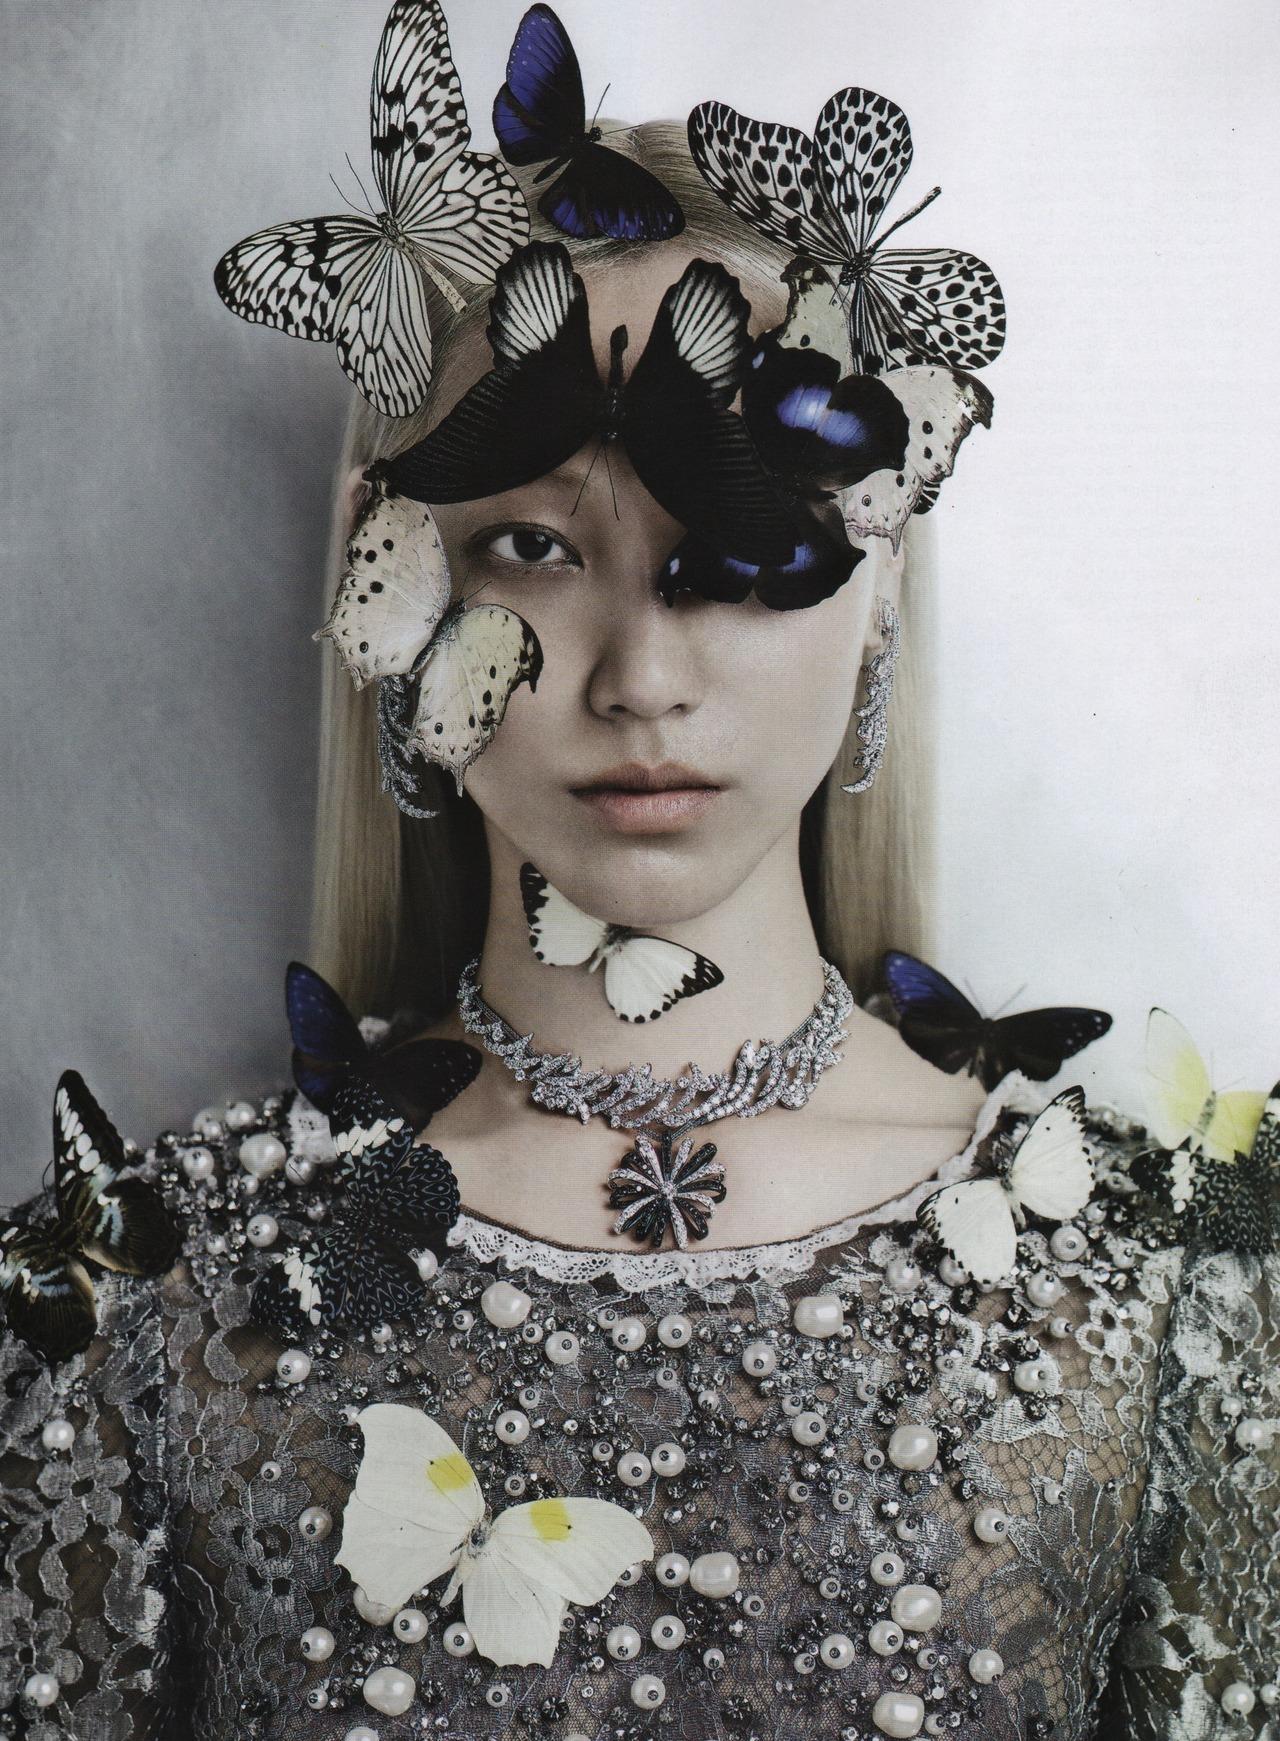 koreanmodel :     Soo Joo by Kevin Mackintosh for Vogue Italia Sept 2012